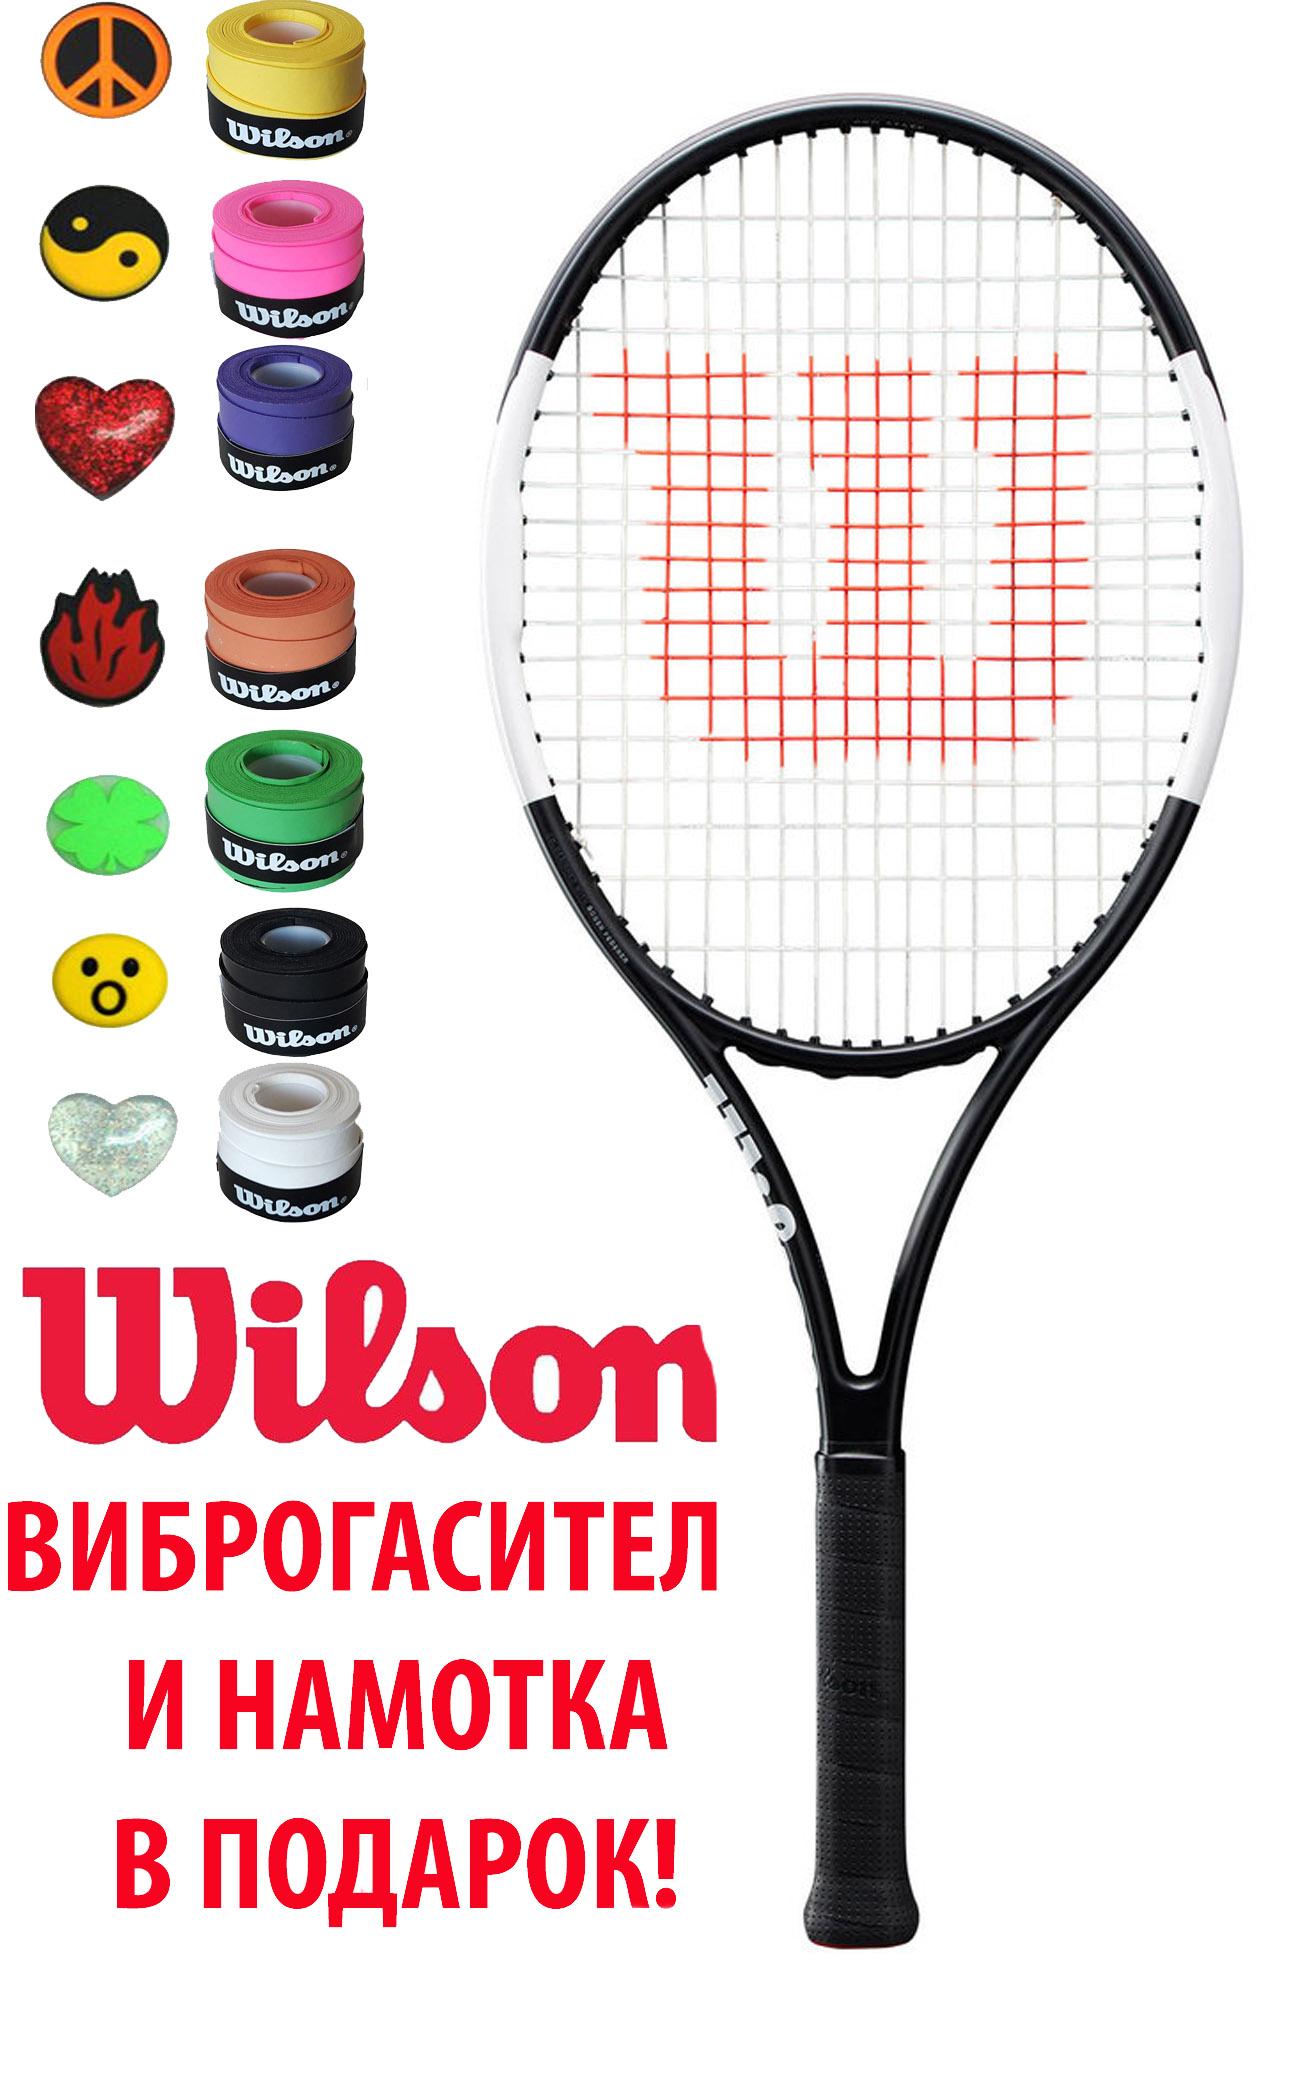 Теннисная ракетка WILSON PRO STAFF 26 2019 + намотка BOWL+ виброгаситель  BOWL в подарок! 5070f74806029